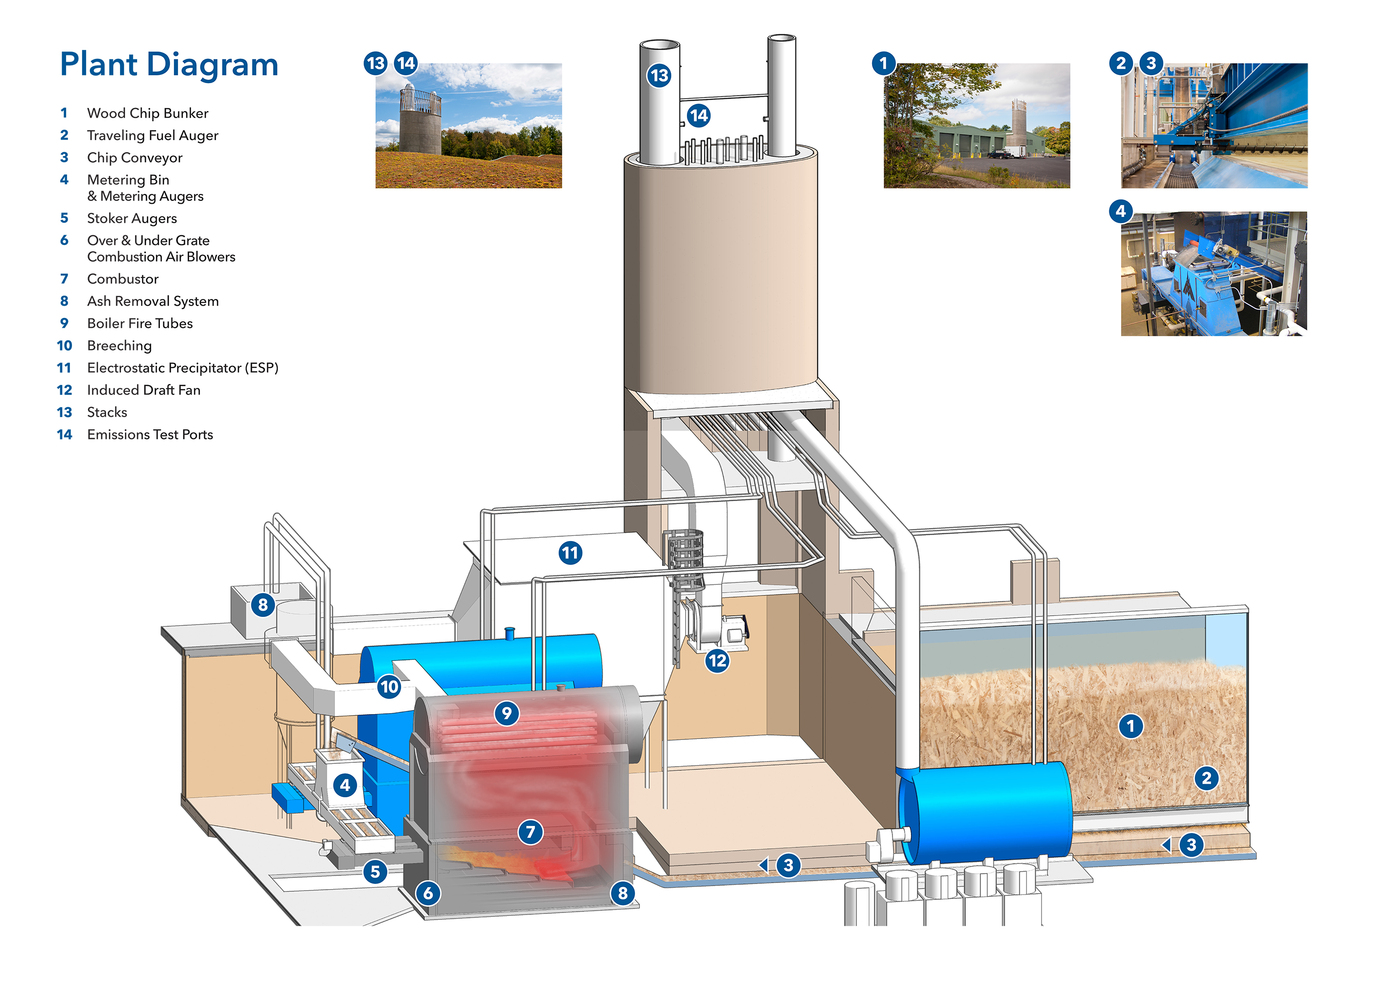 hotchkiss biomass power plant centerbrook architects planners plant diagram [ 1400 x 1000 Pixel ]